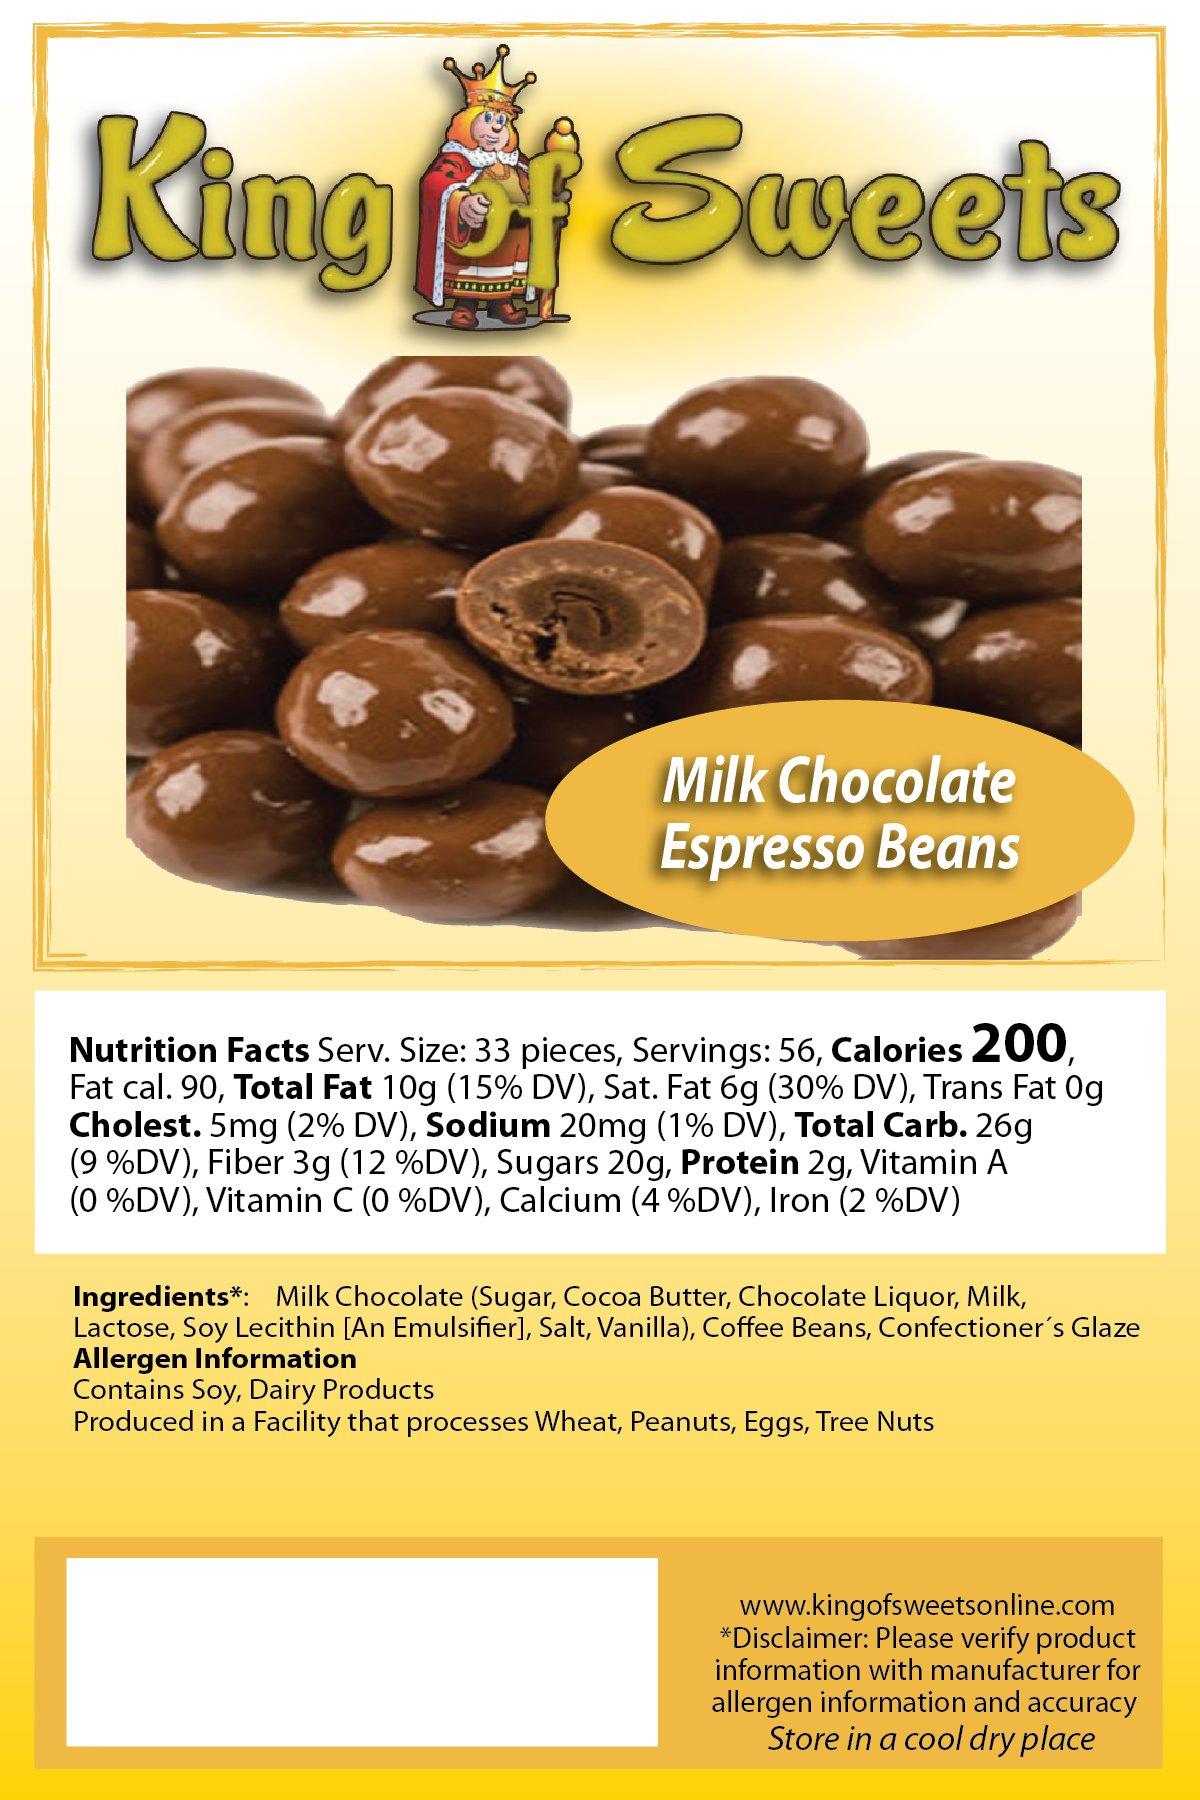 Milk Chocolate Espresso Beans (1 x 5lb bag)